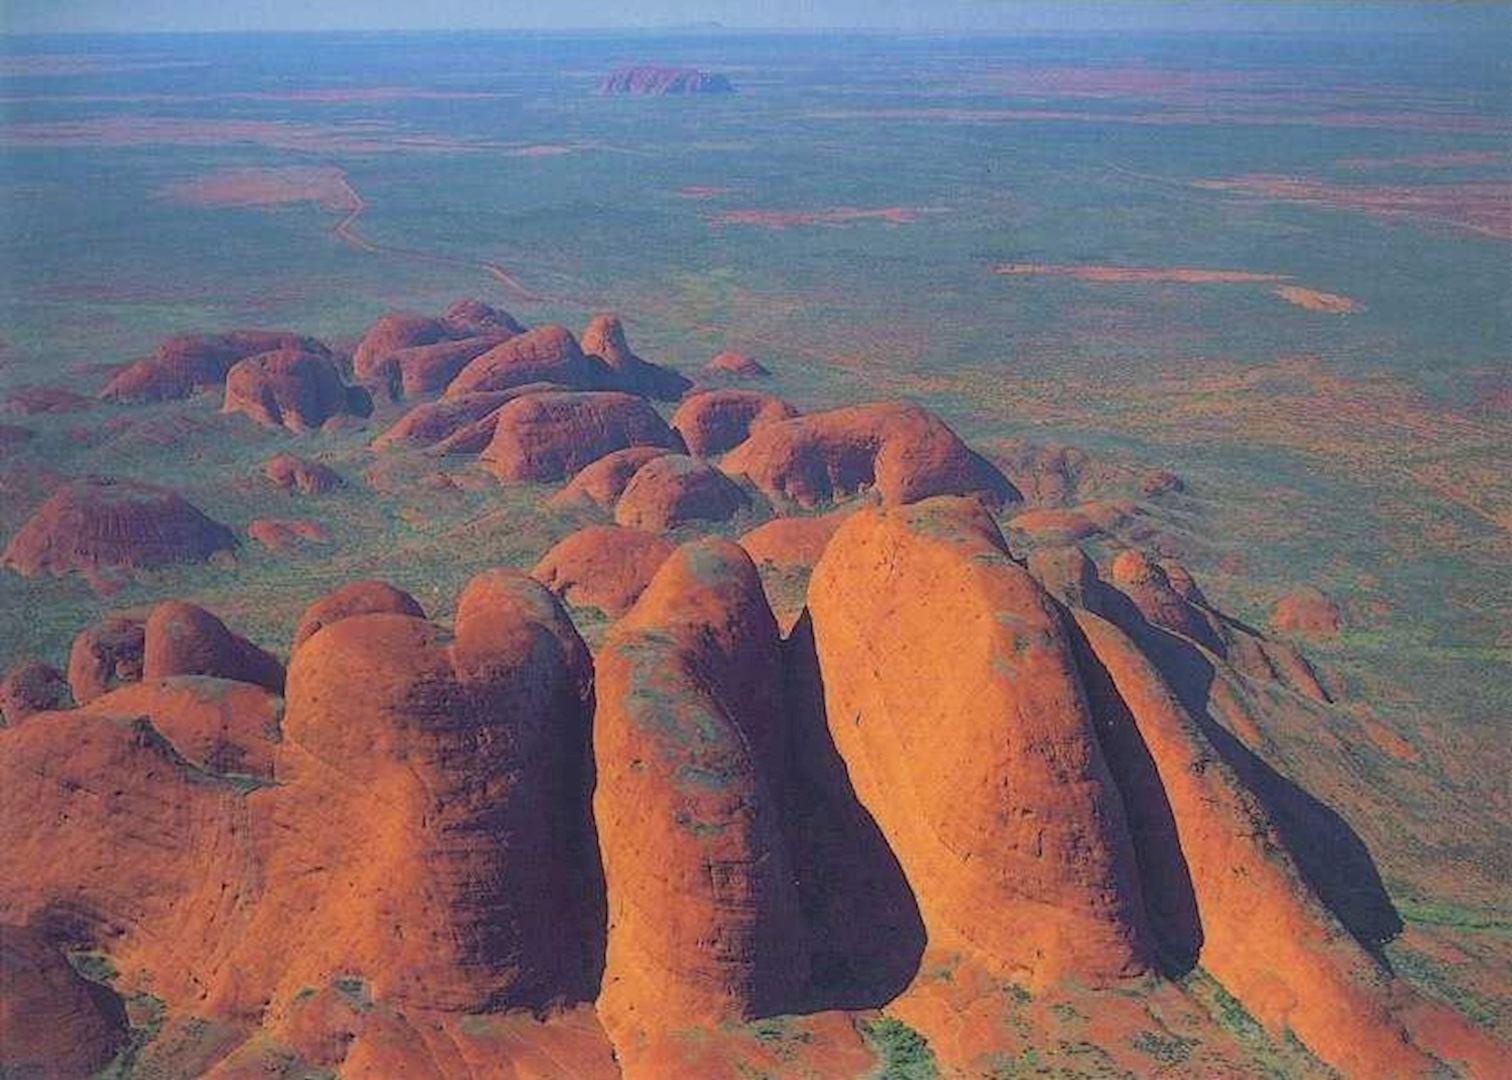 Uluru Also Known As Ayers Rock Huge Sandstone Kata Tjuta ... |Uluru Kata Tjuta National Park Australia